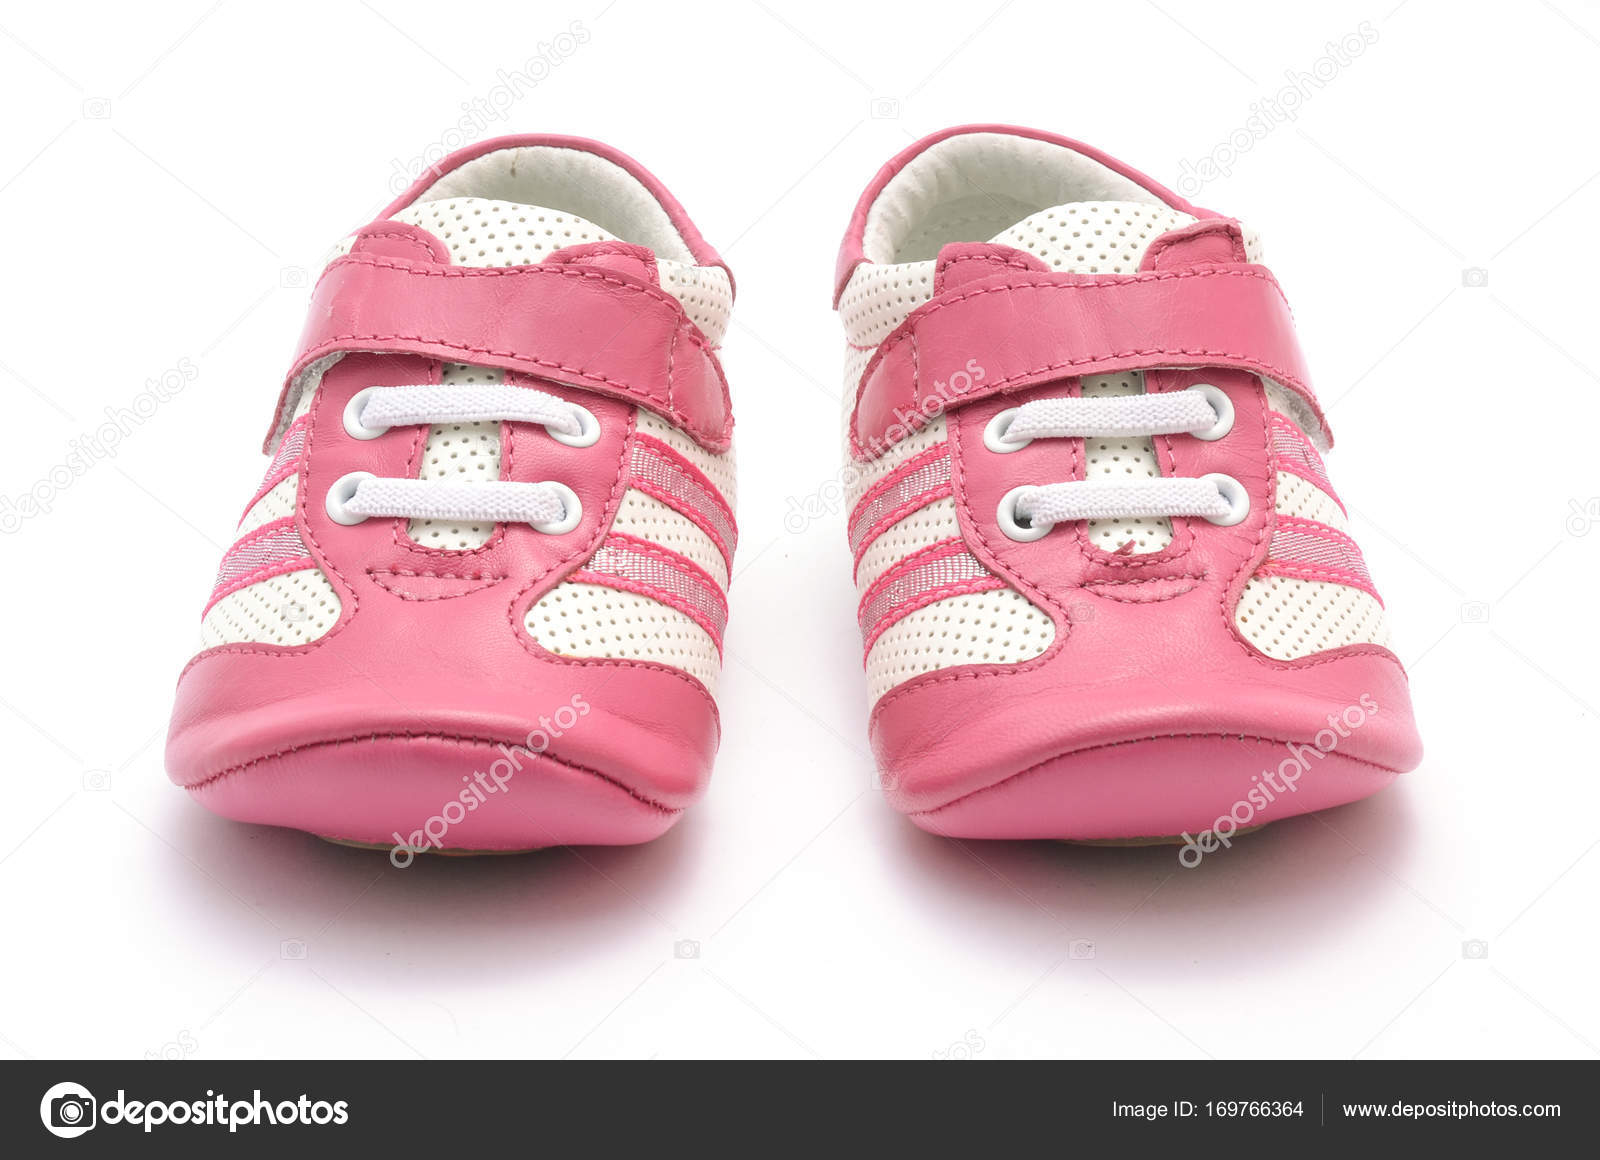 6b8153c450b Πάνινα παπούτσια για το μωρό που απομονώνονται σε λευκό — Φωτογραφία Αρχείου